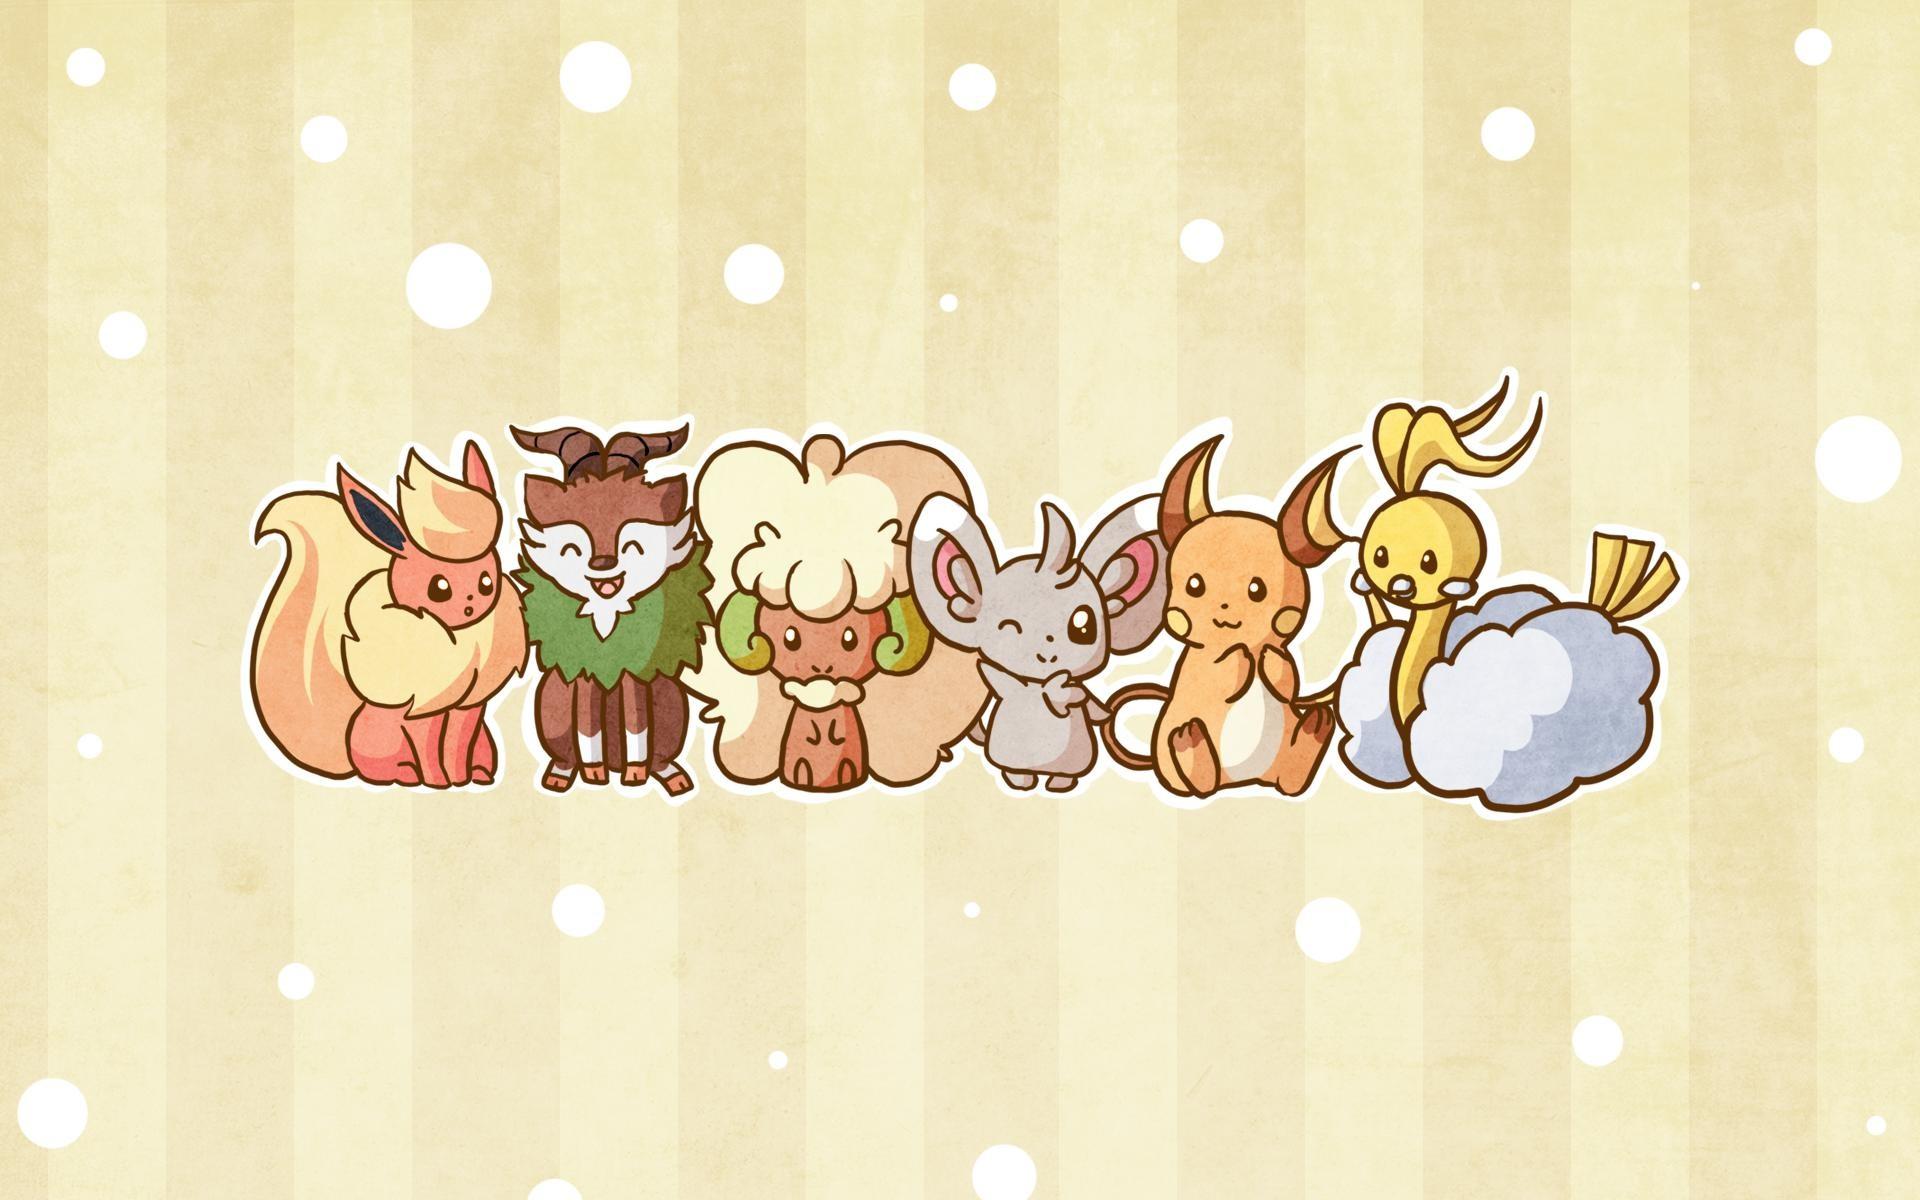 [ART] My cute and fluffy team wallpaper!